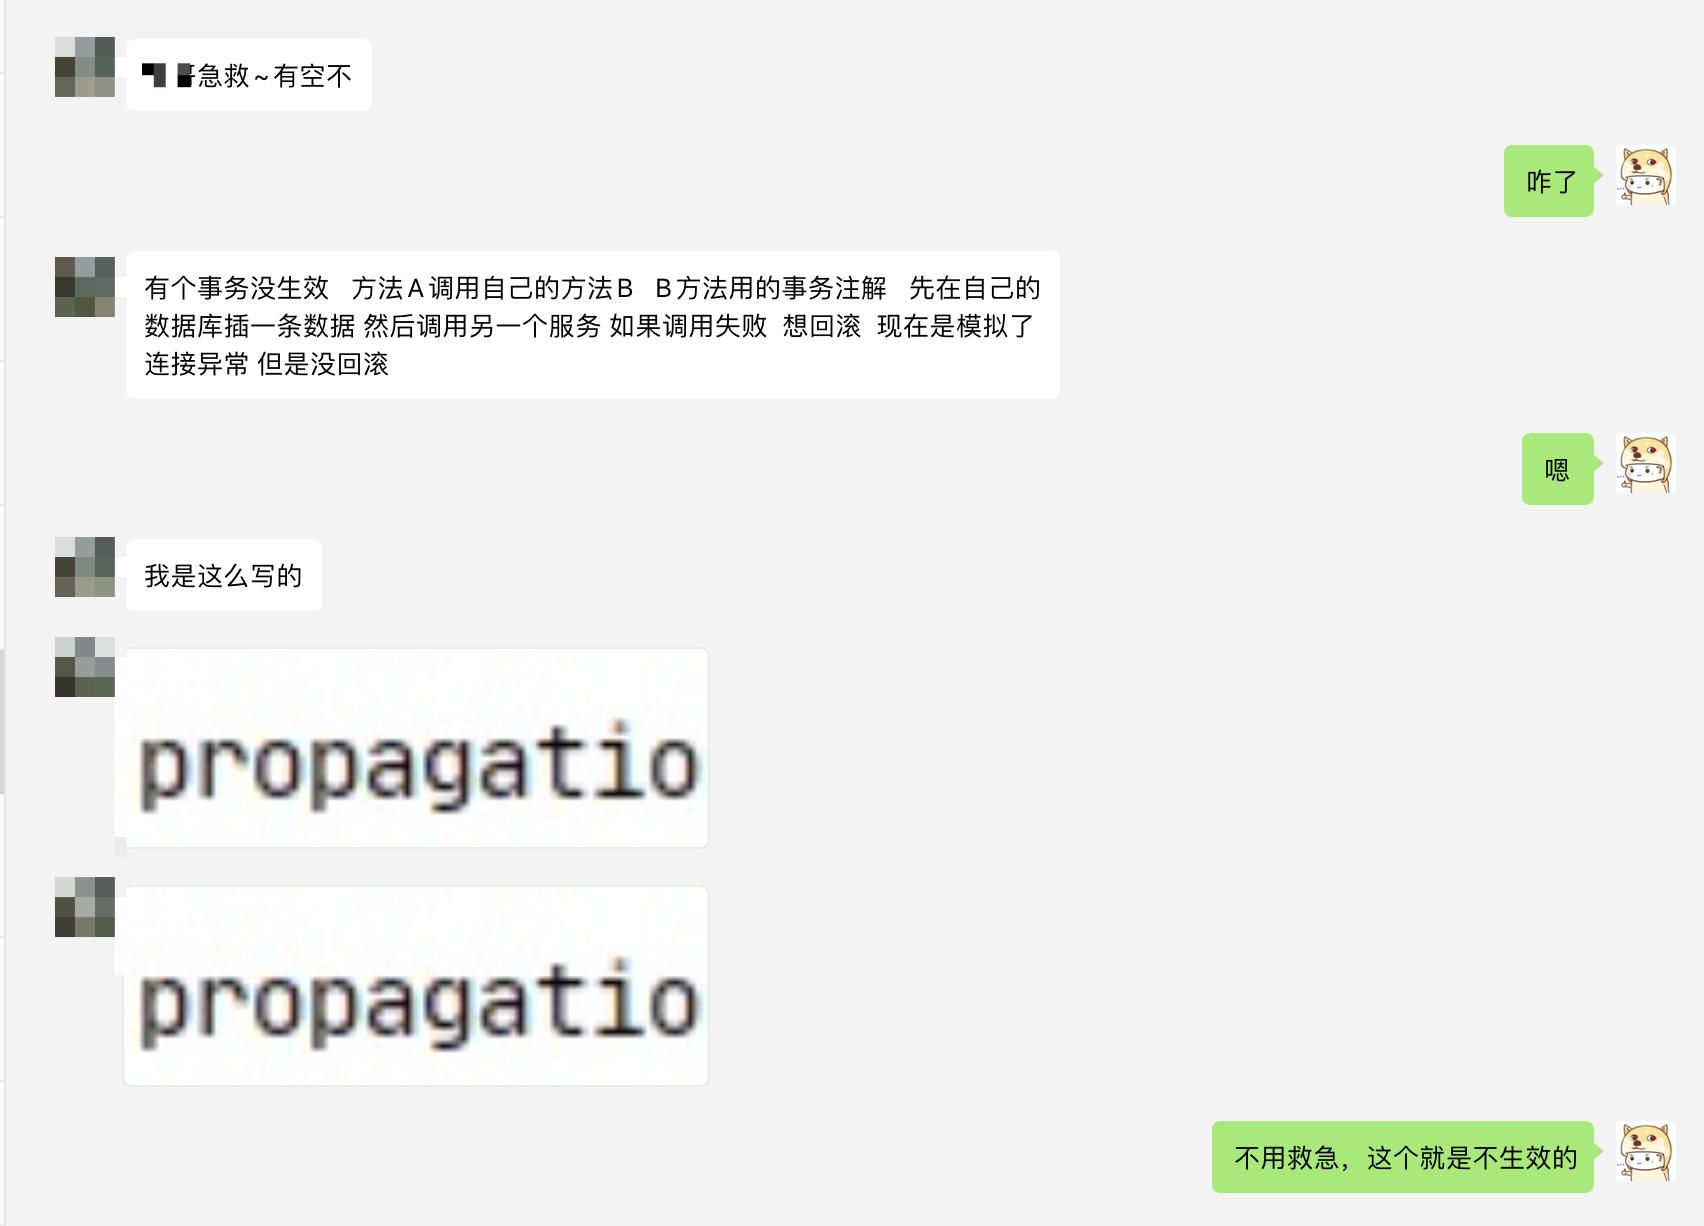 3E8q0W-3Cg65u